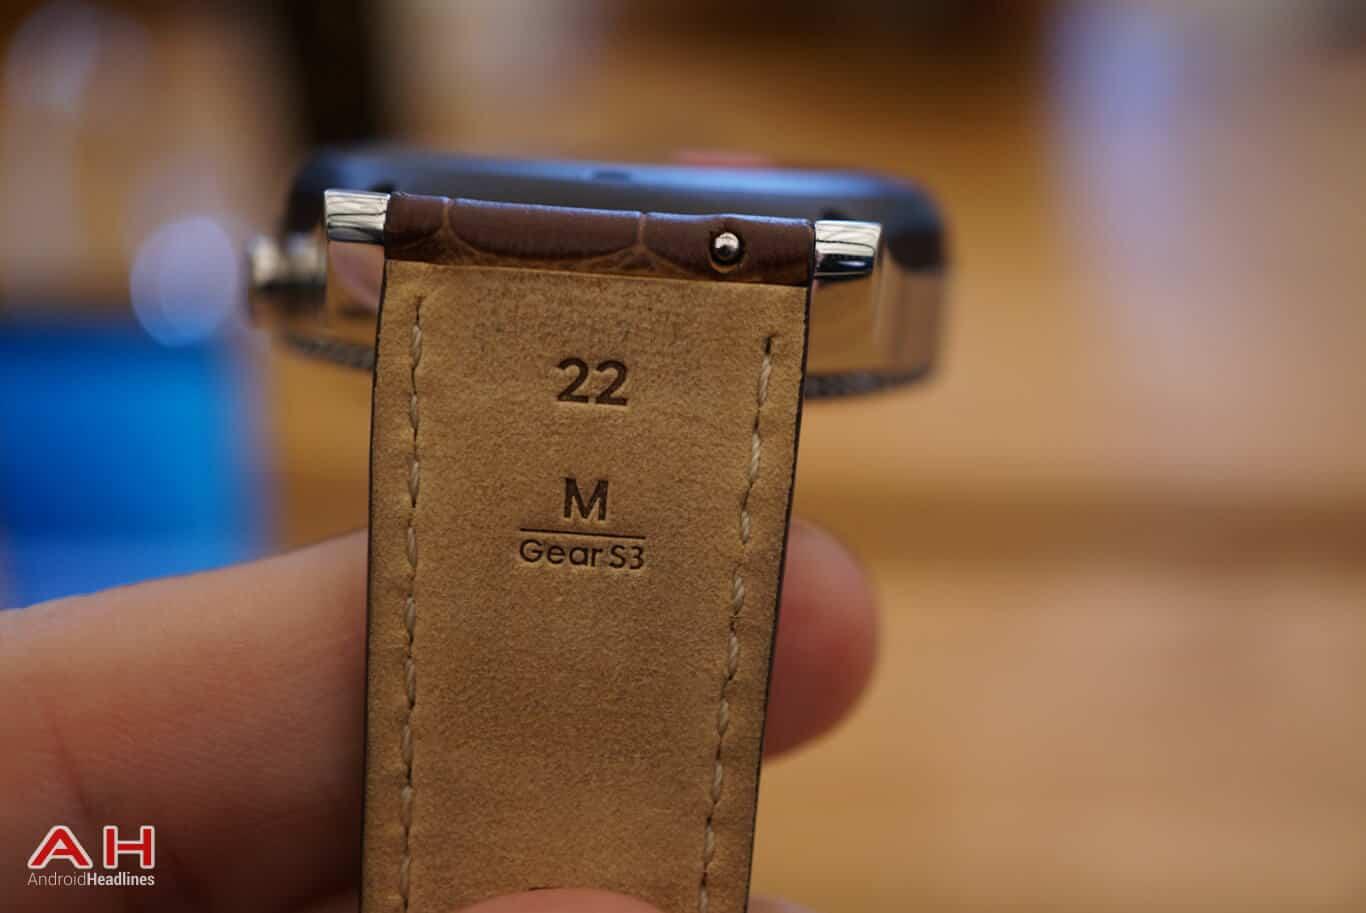 Samsung Gear S3 AH 19